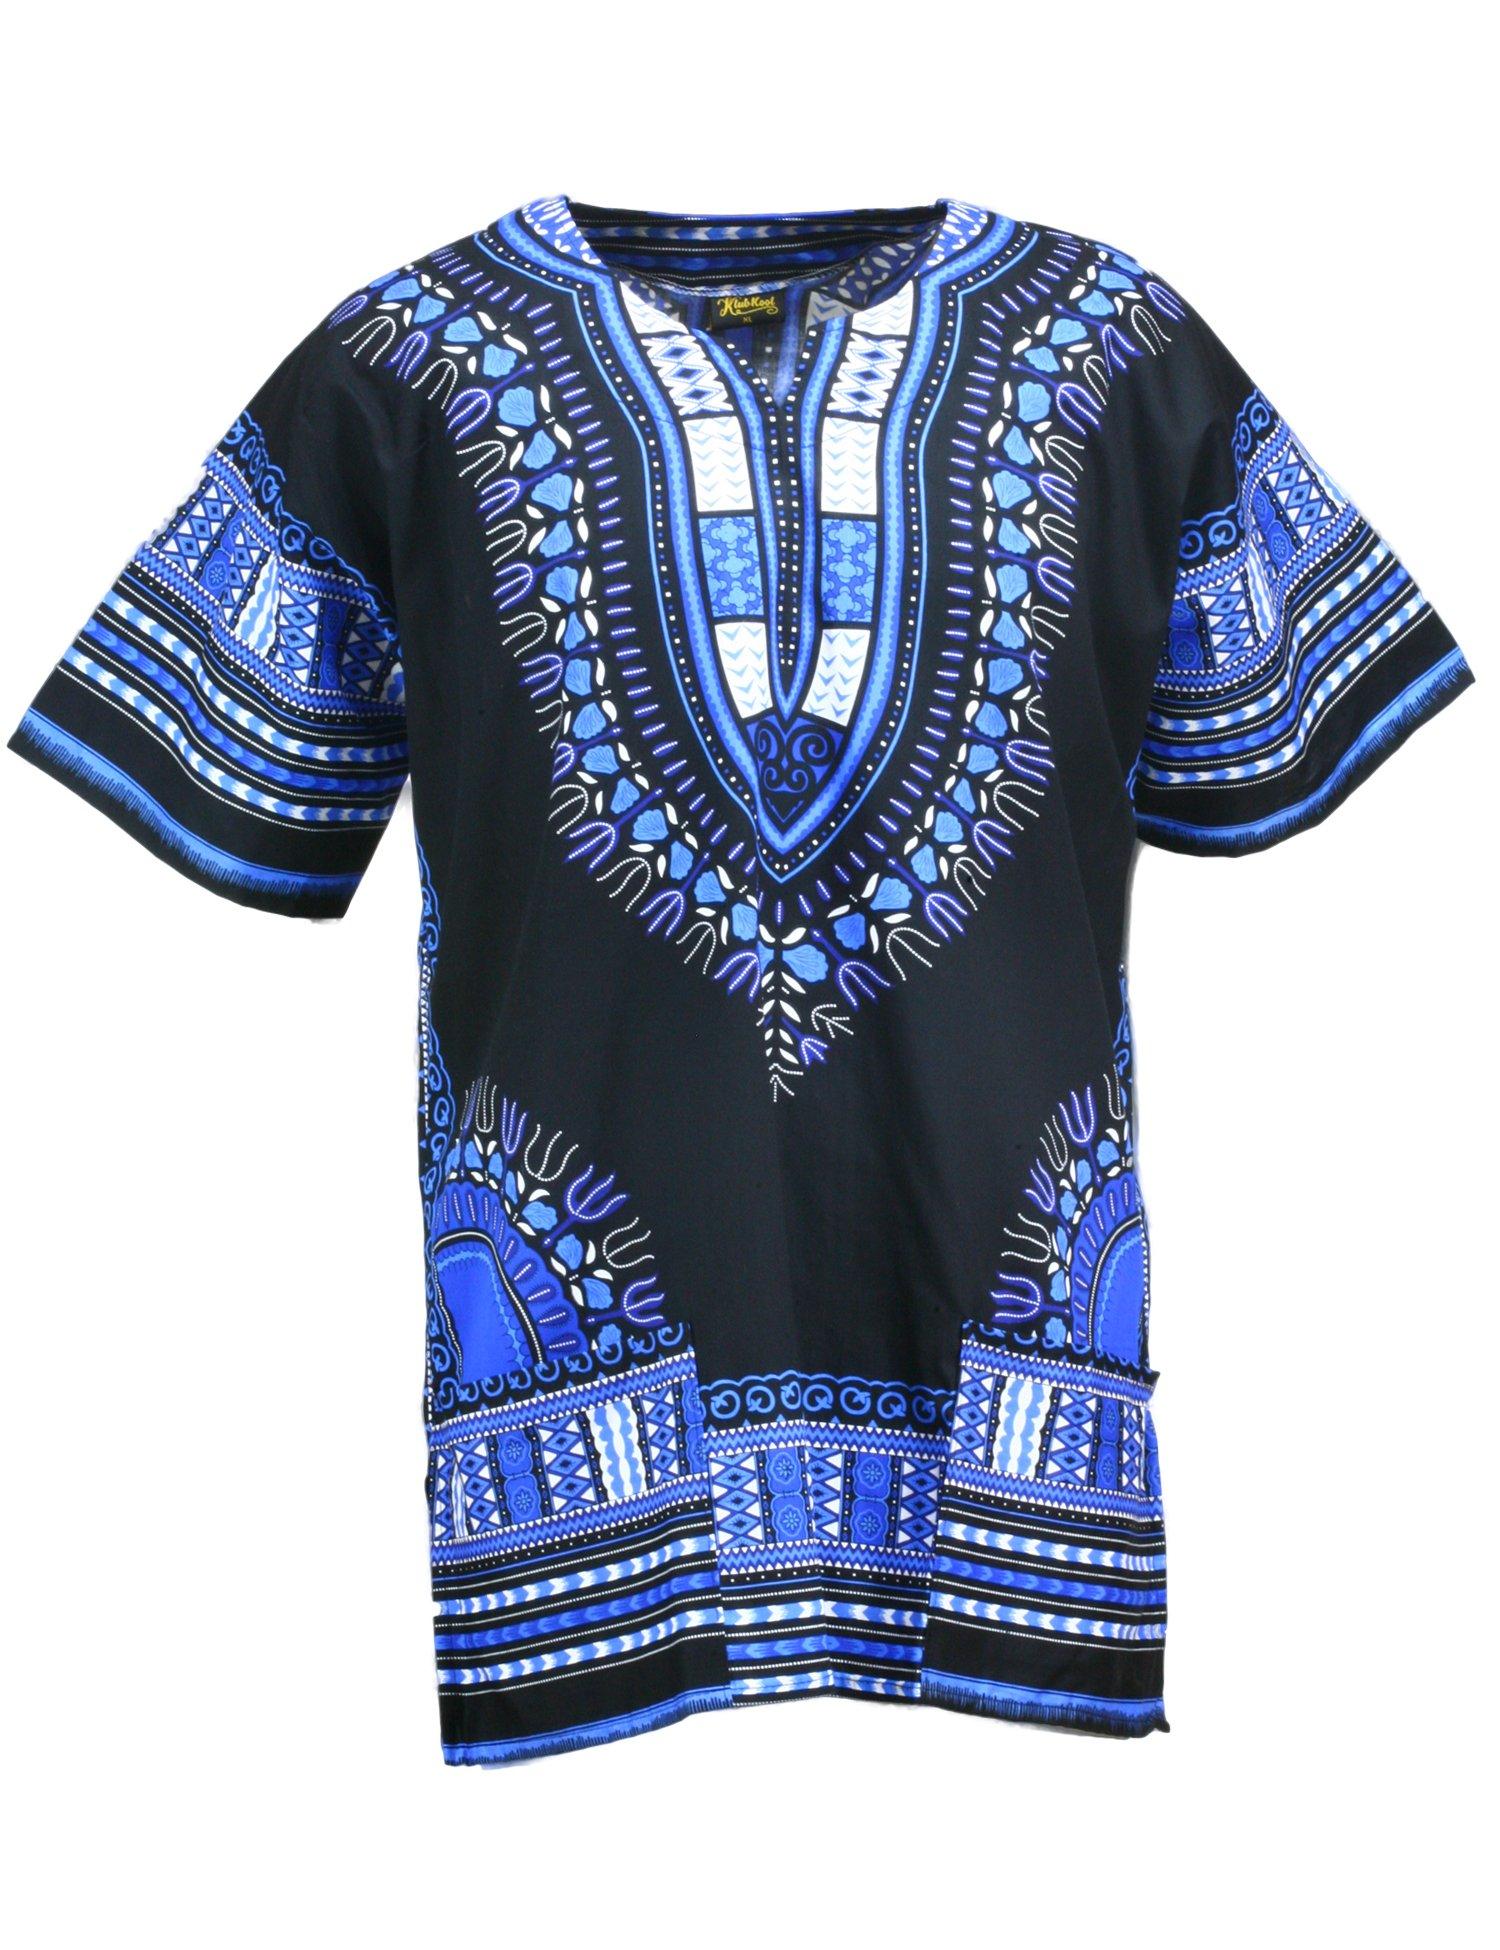 KlubKool Dashiki Shirt Tribal African Caftan Boho Unisex Top Shirt (Black/Blue,Medium)